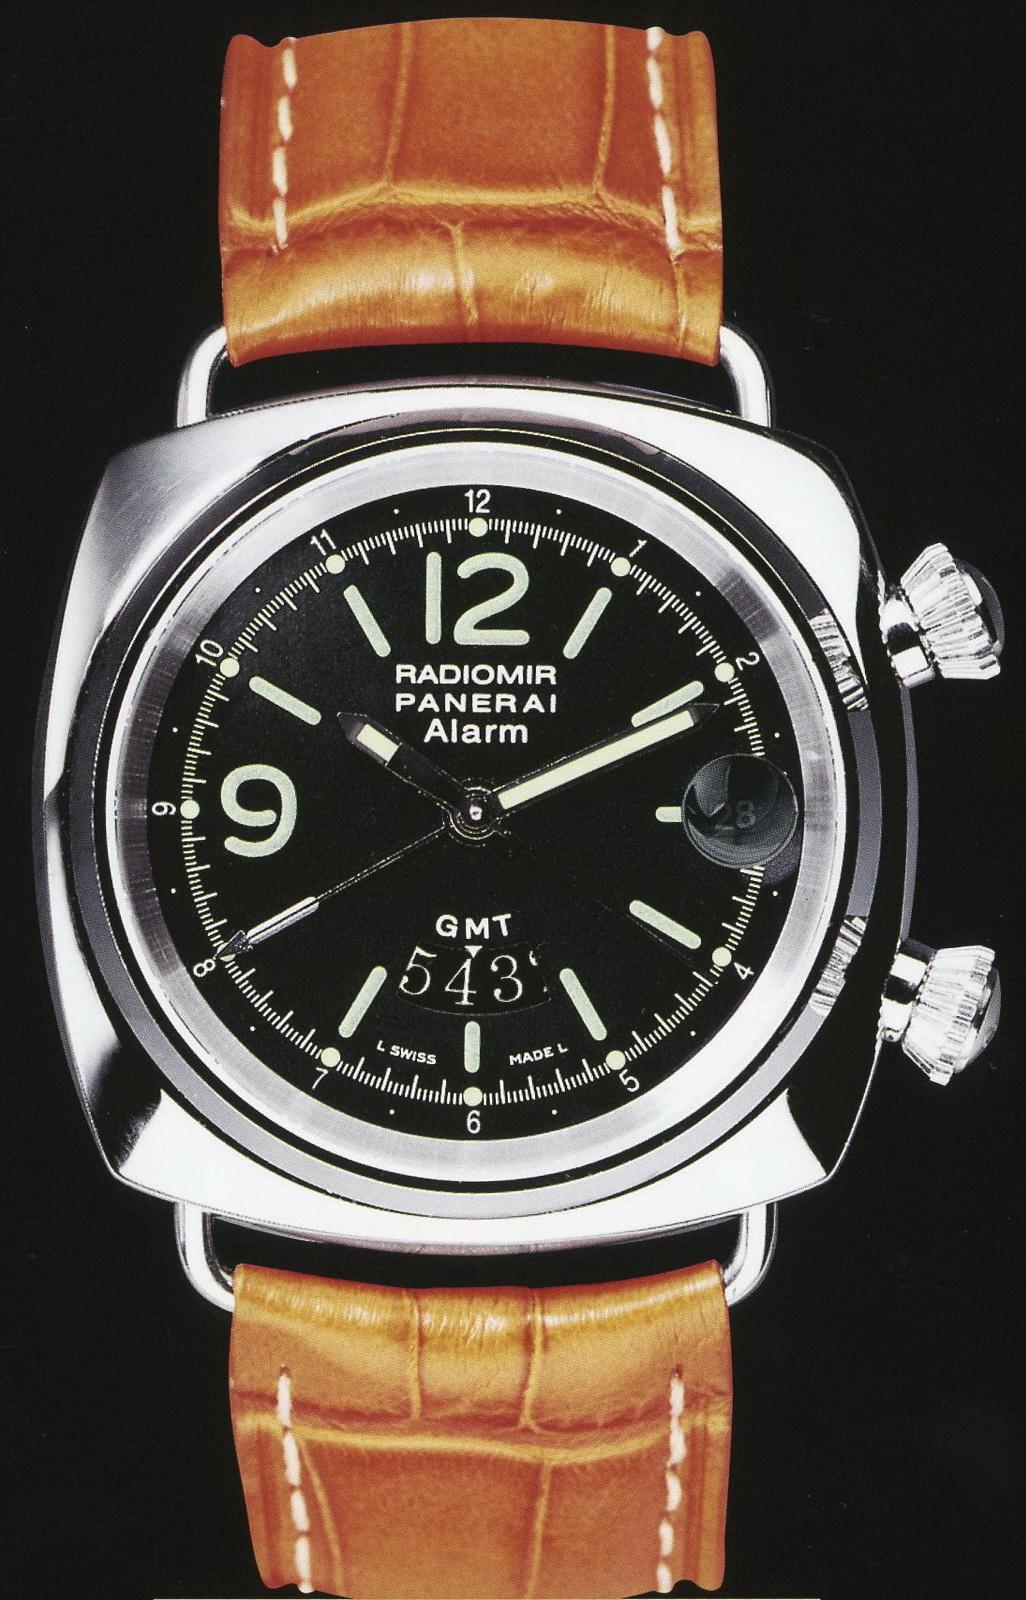 часы Panerai 1999 Special Edition Radiomir GMT/Alarm